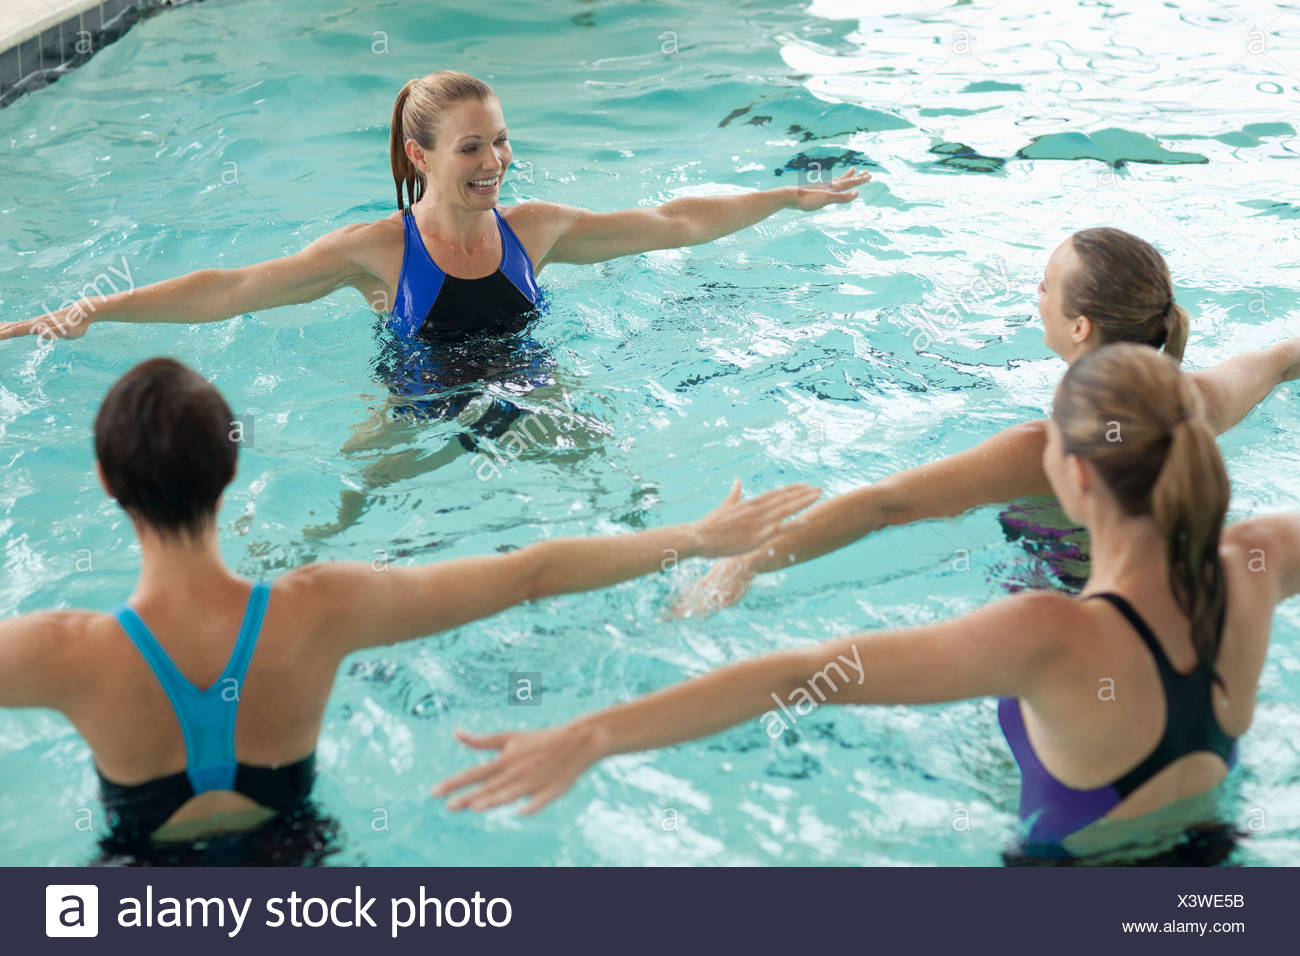 Women taking water aerobics class - Stock Image